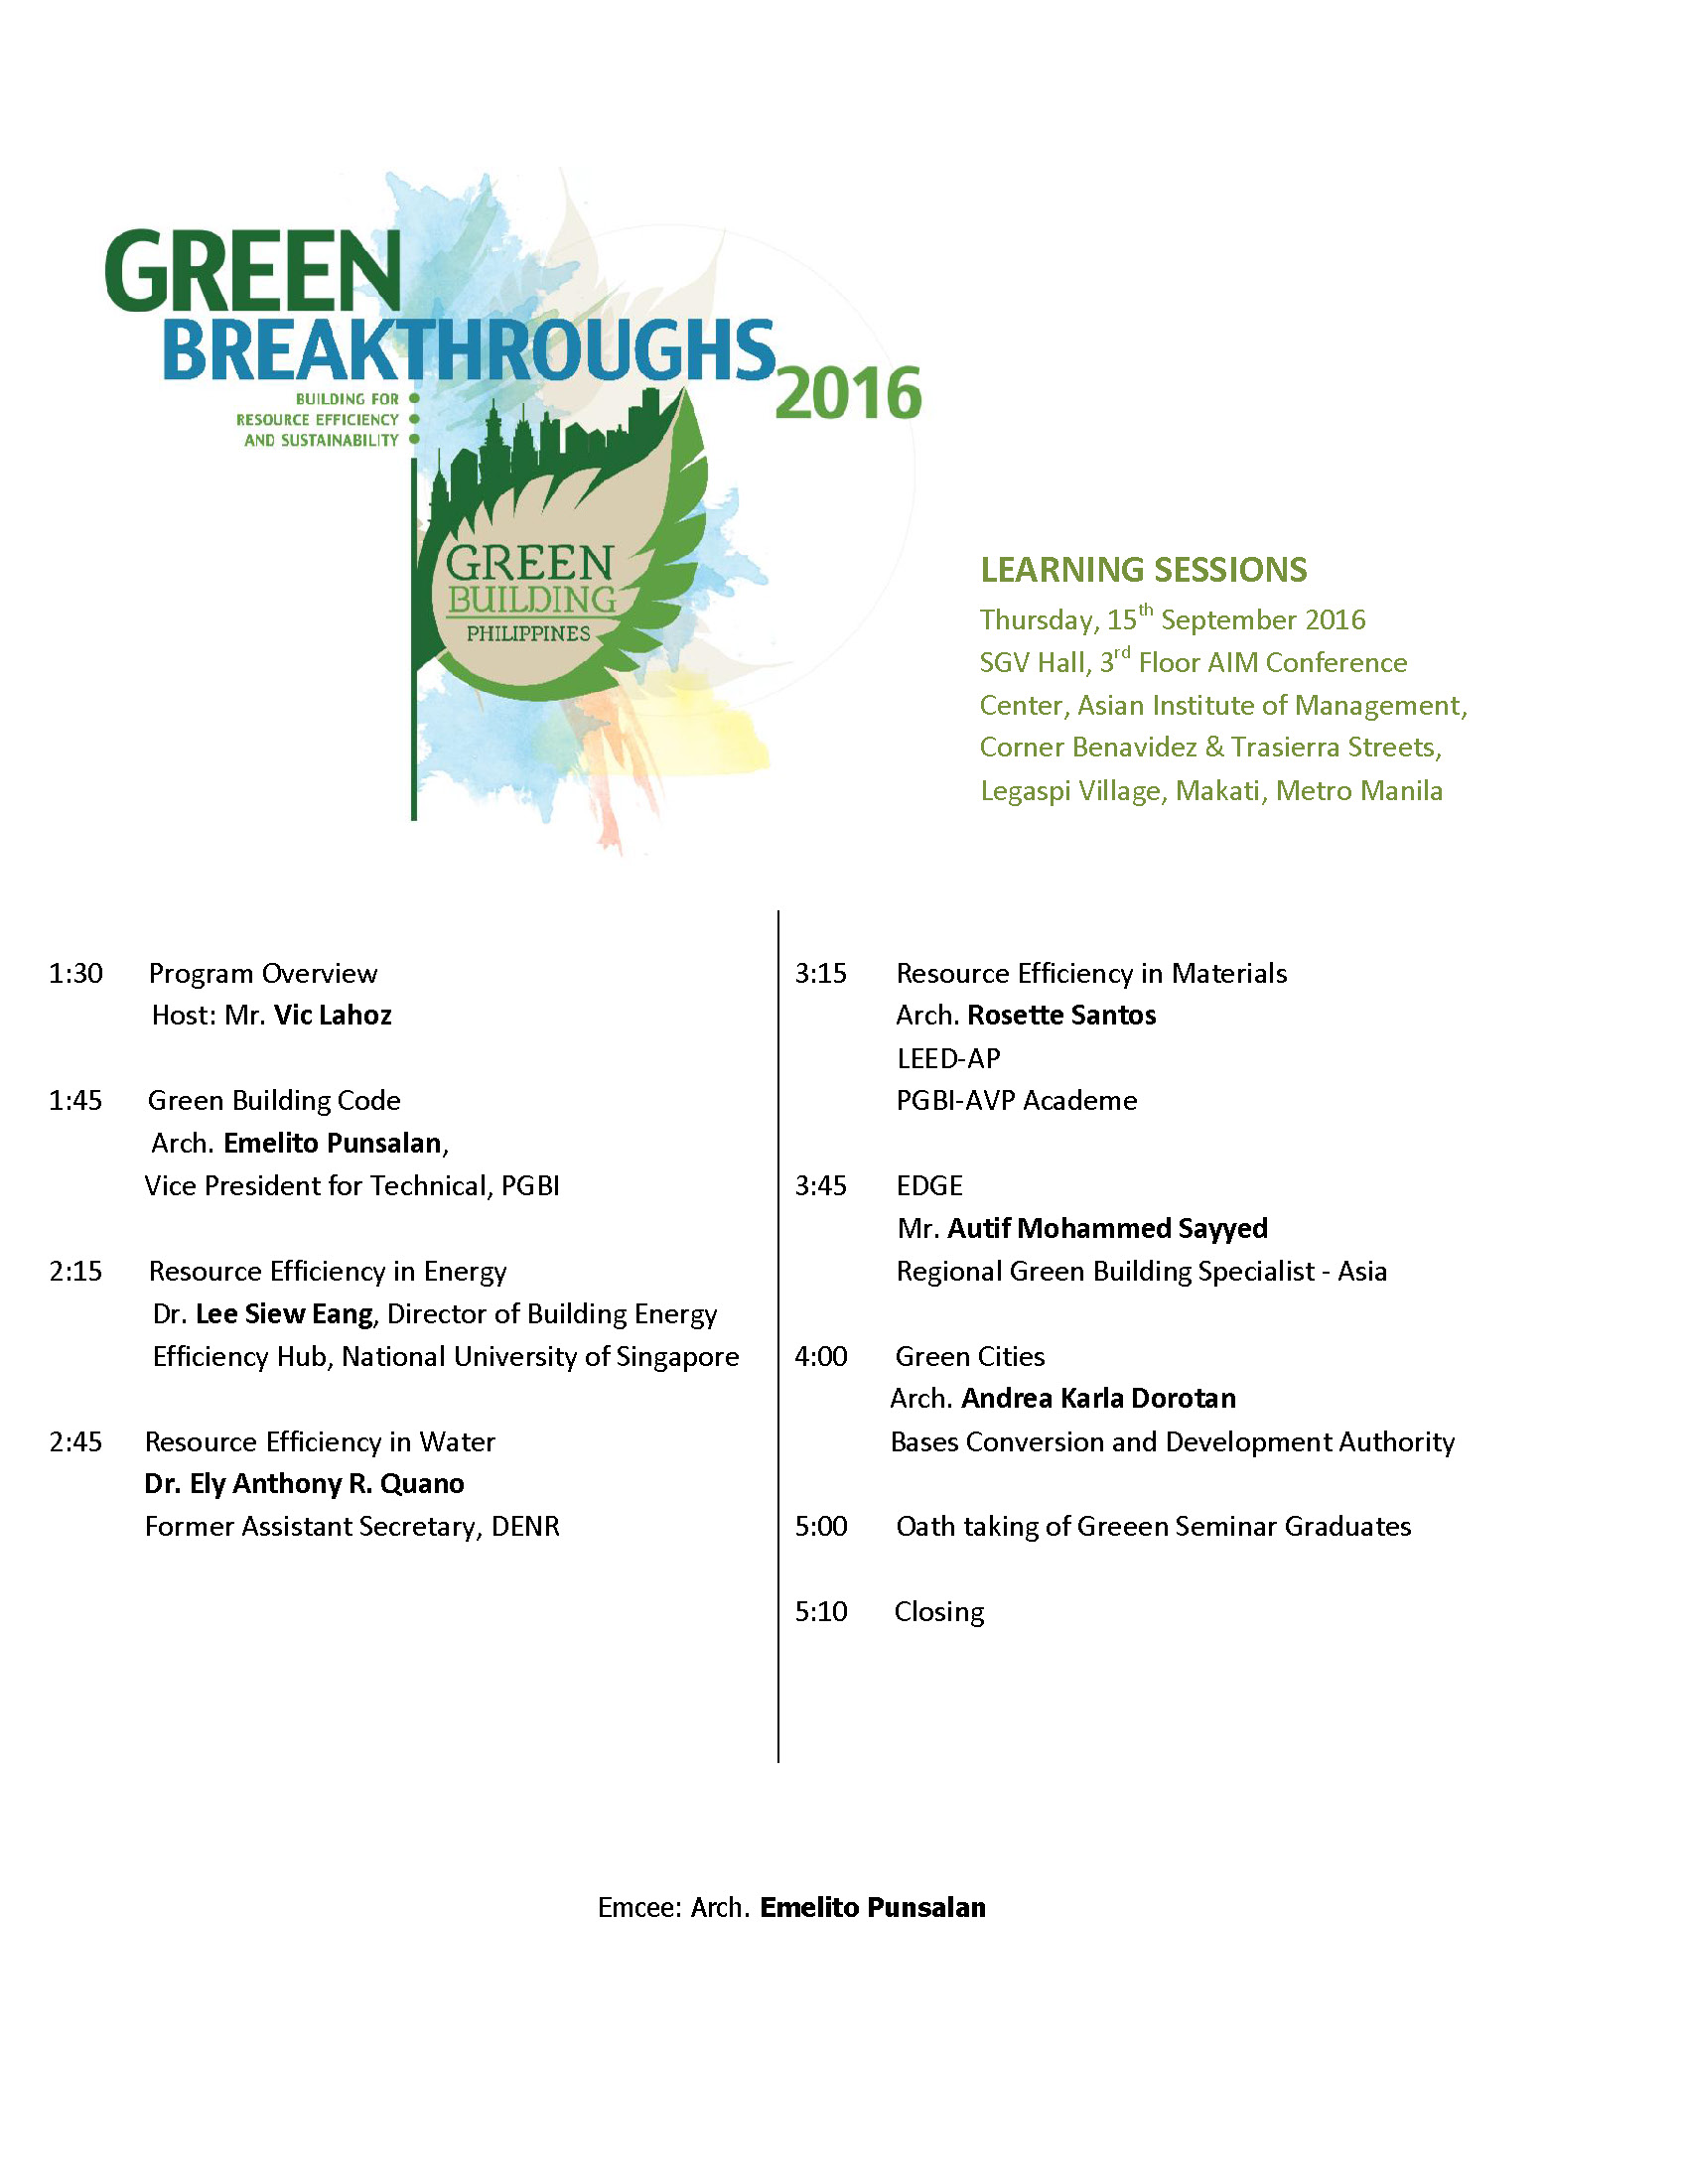 green-breakthroughs-2016-program_page_2